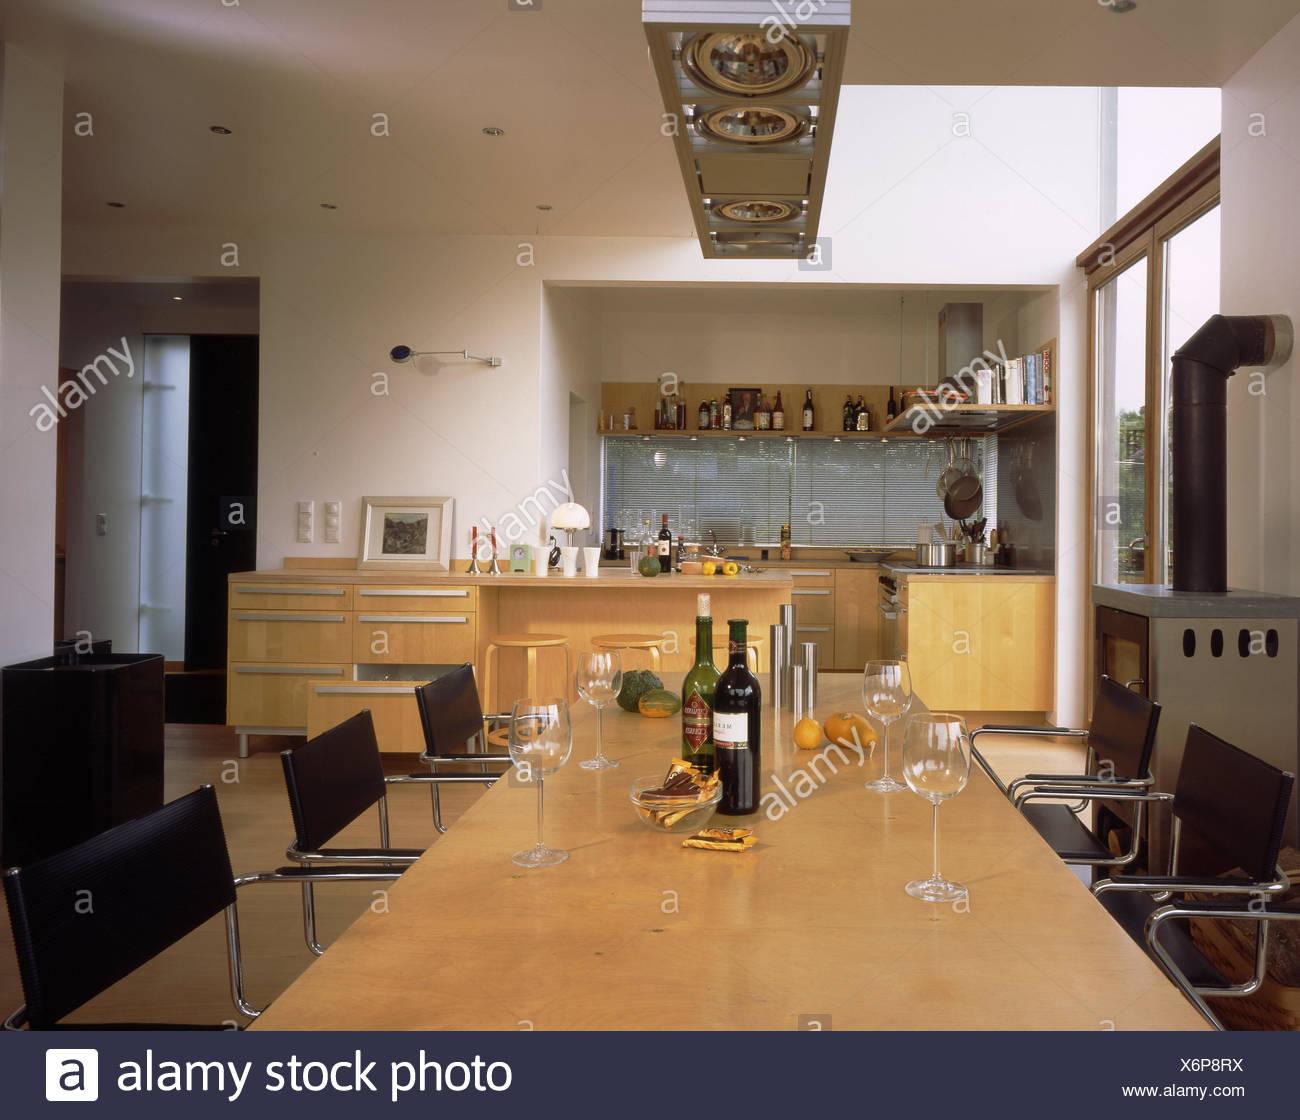 Casa residenziale, cucina-soggiorno, cucina, cucina, unità ...